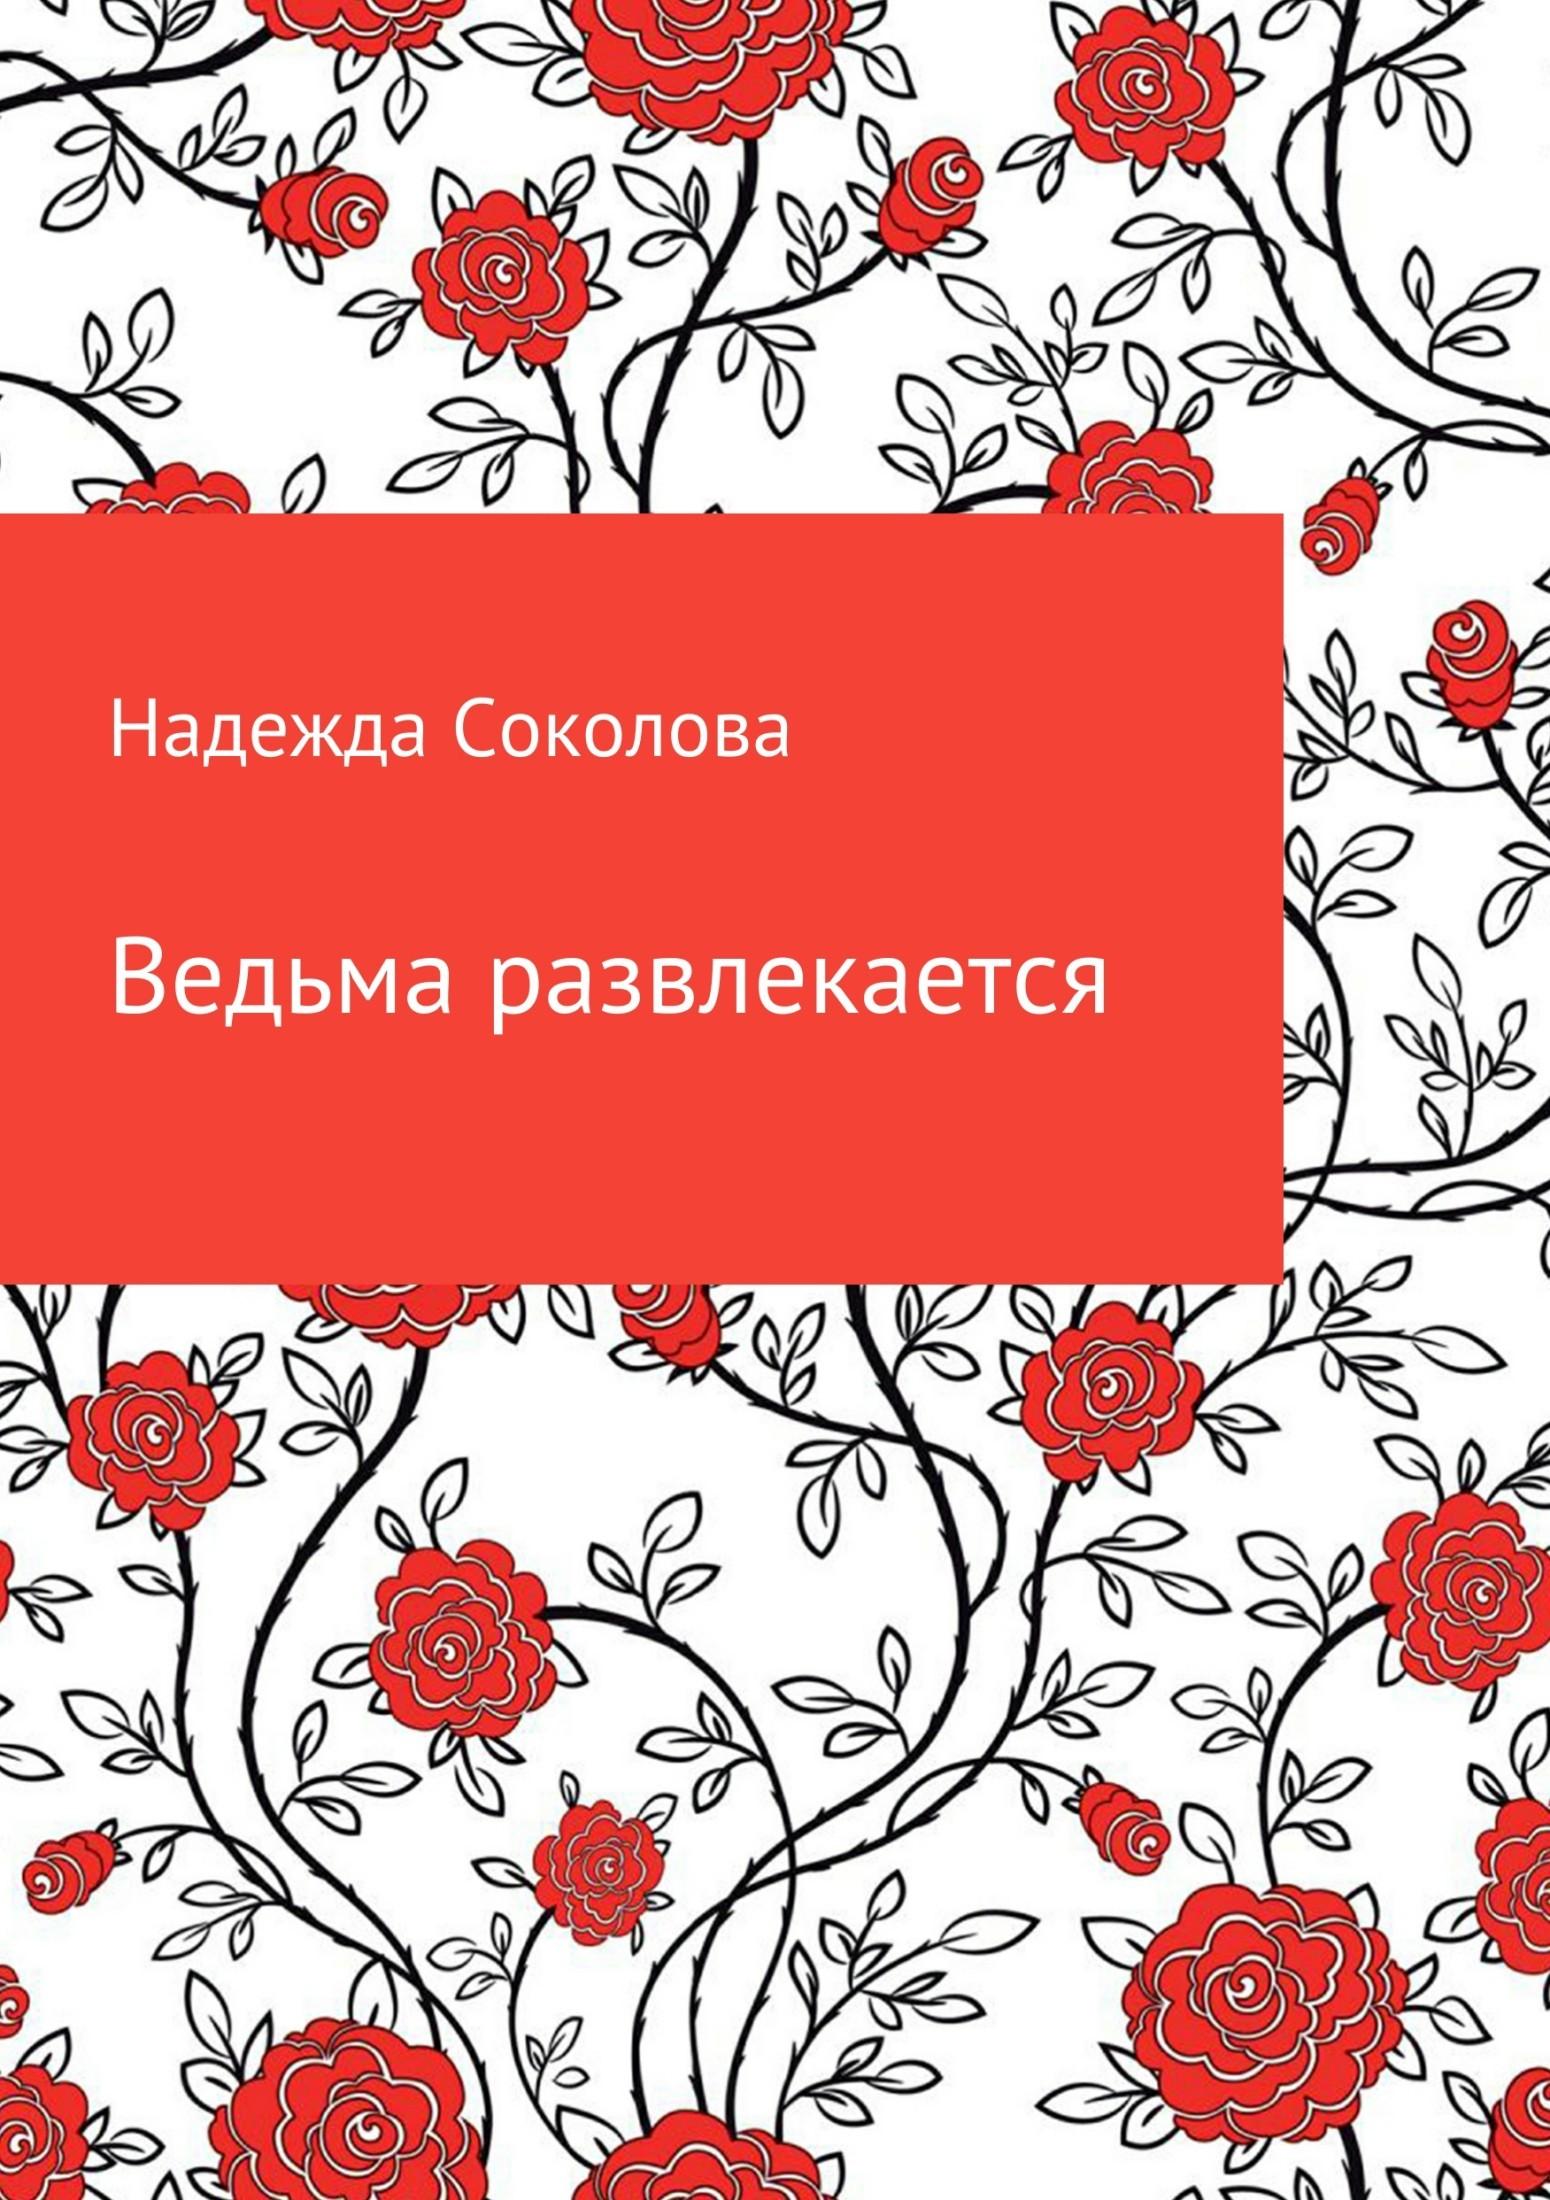 Надежда Игоревна Соколова бесплатно